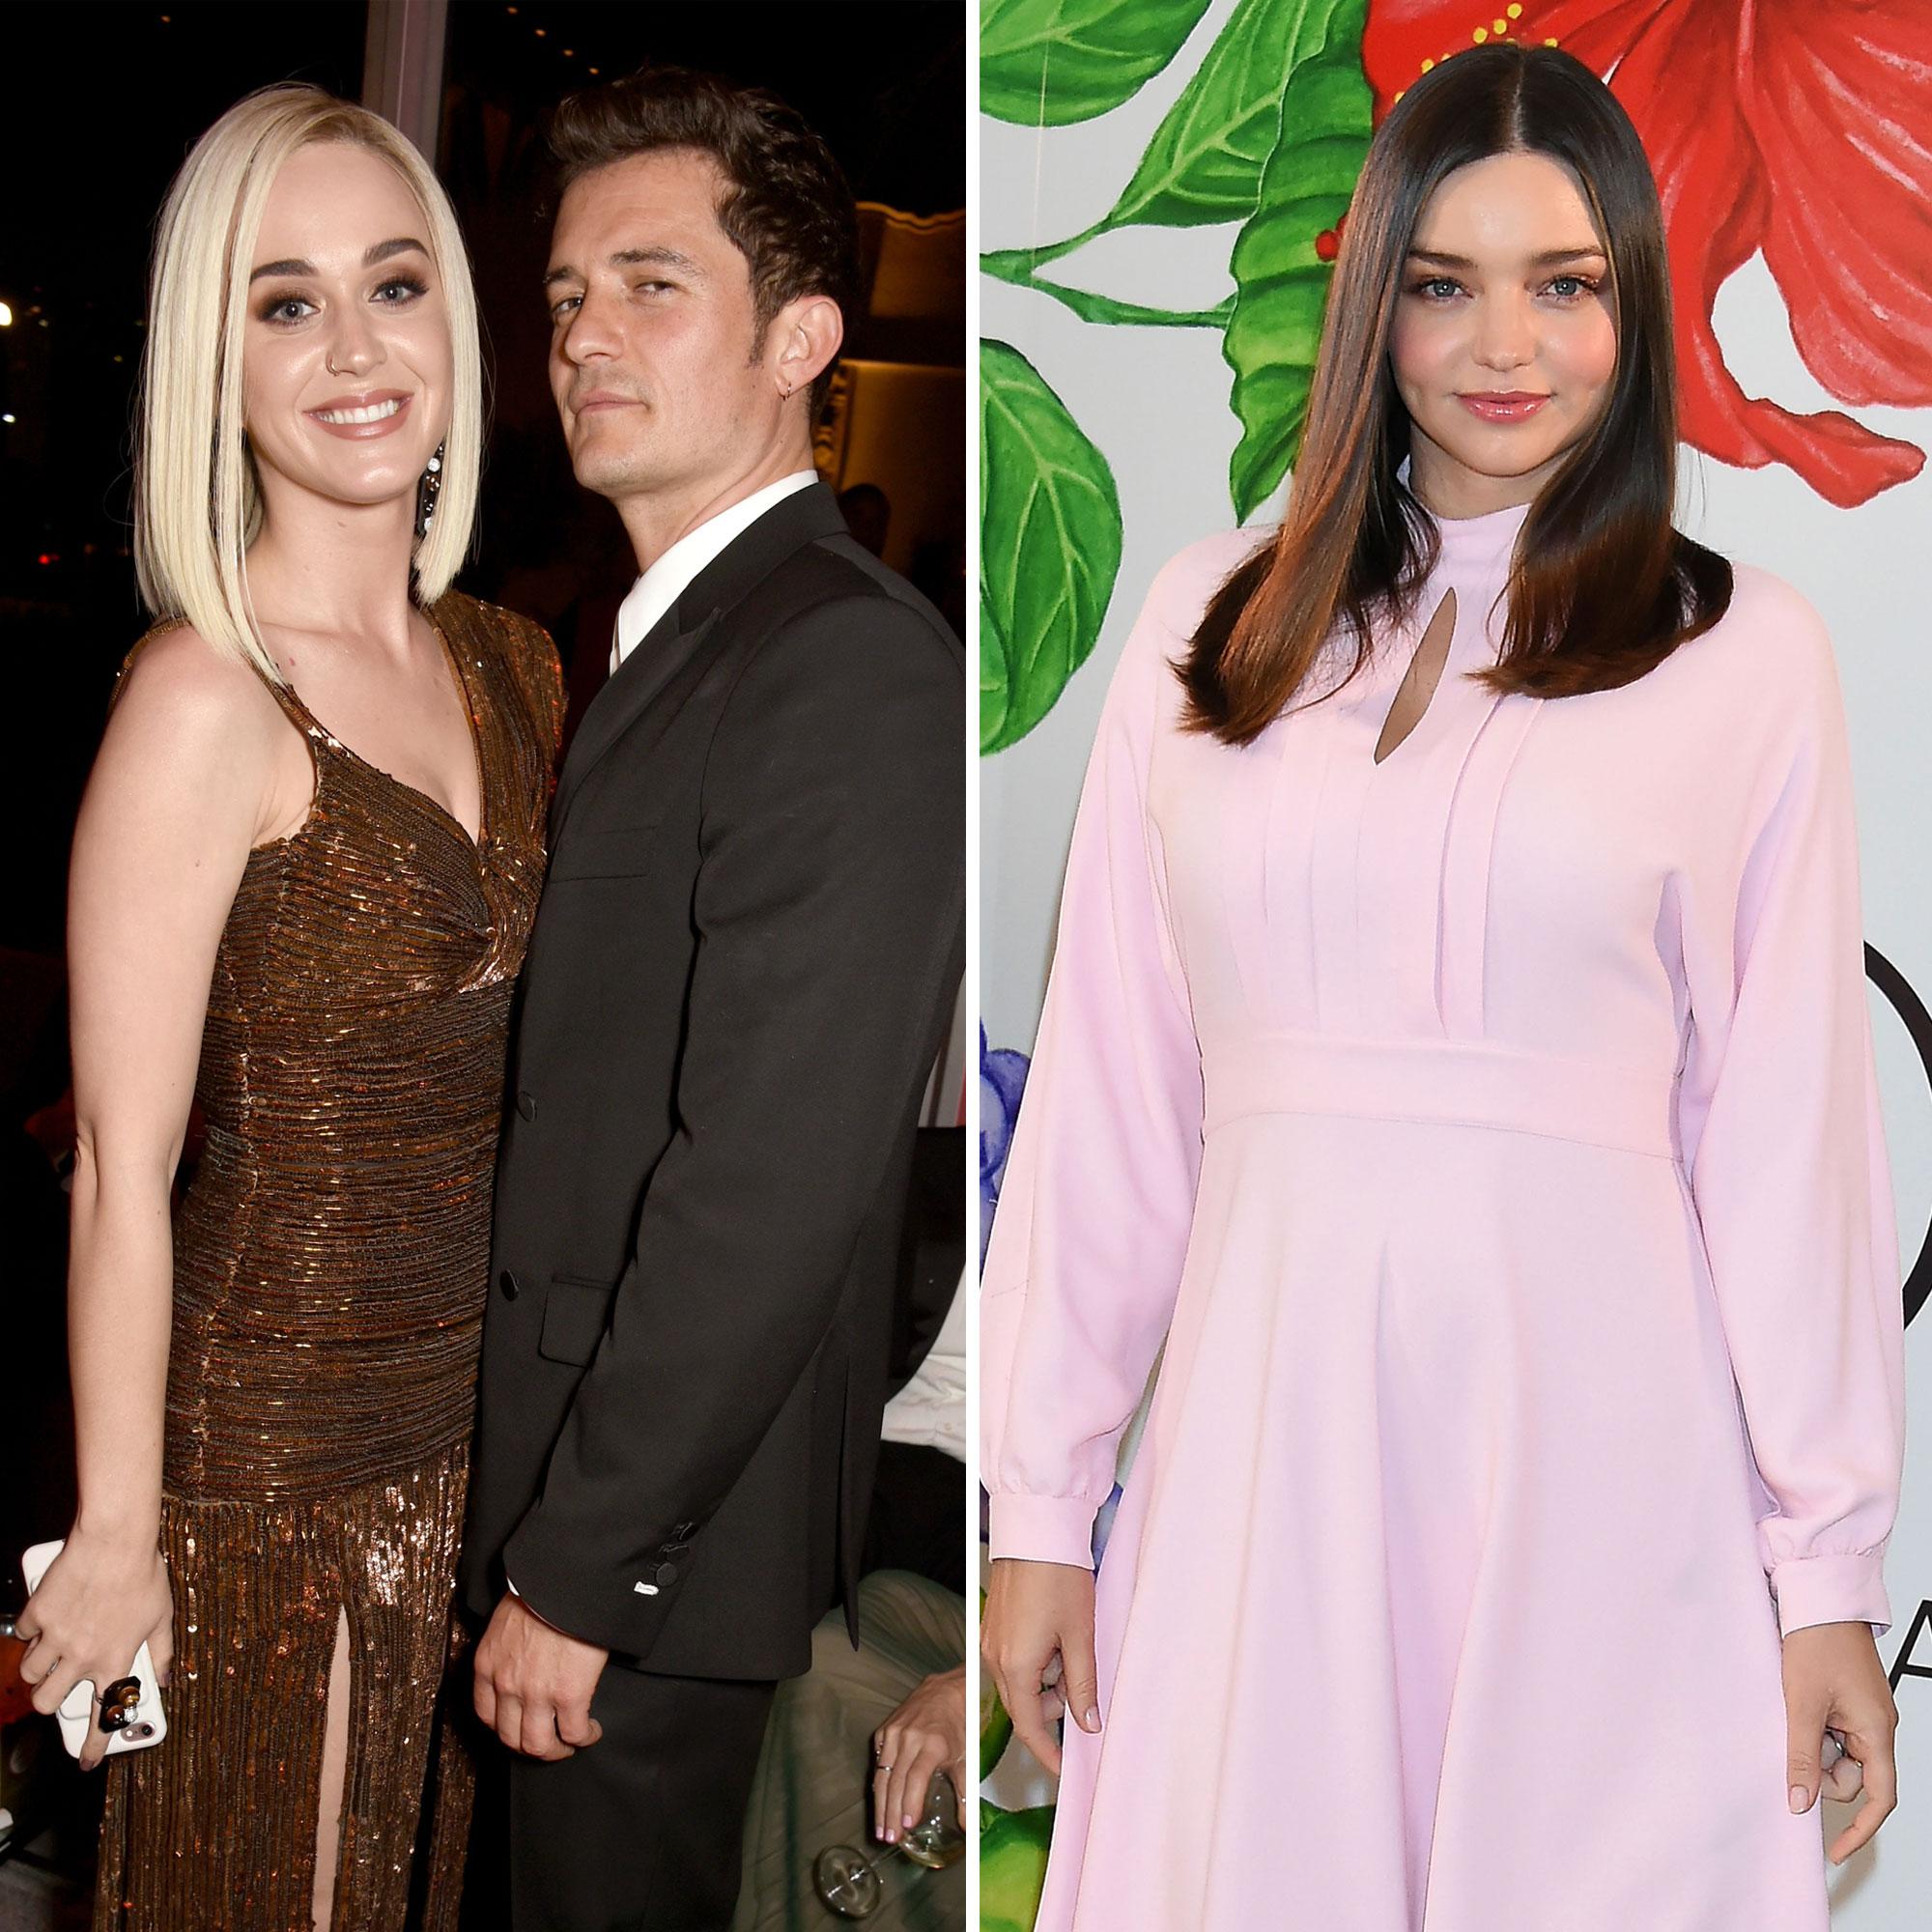 Orlando Bloom Gave Katy Perry Miranda Kerr Eerily Similar Rings